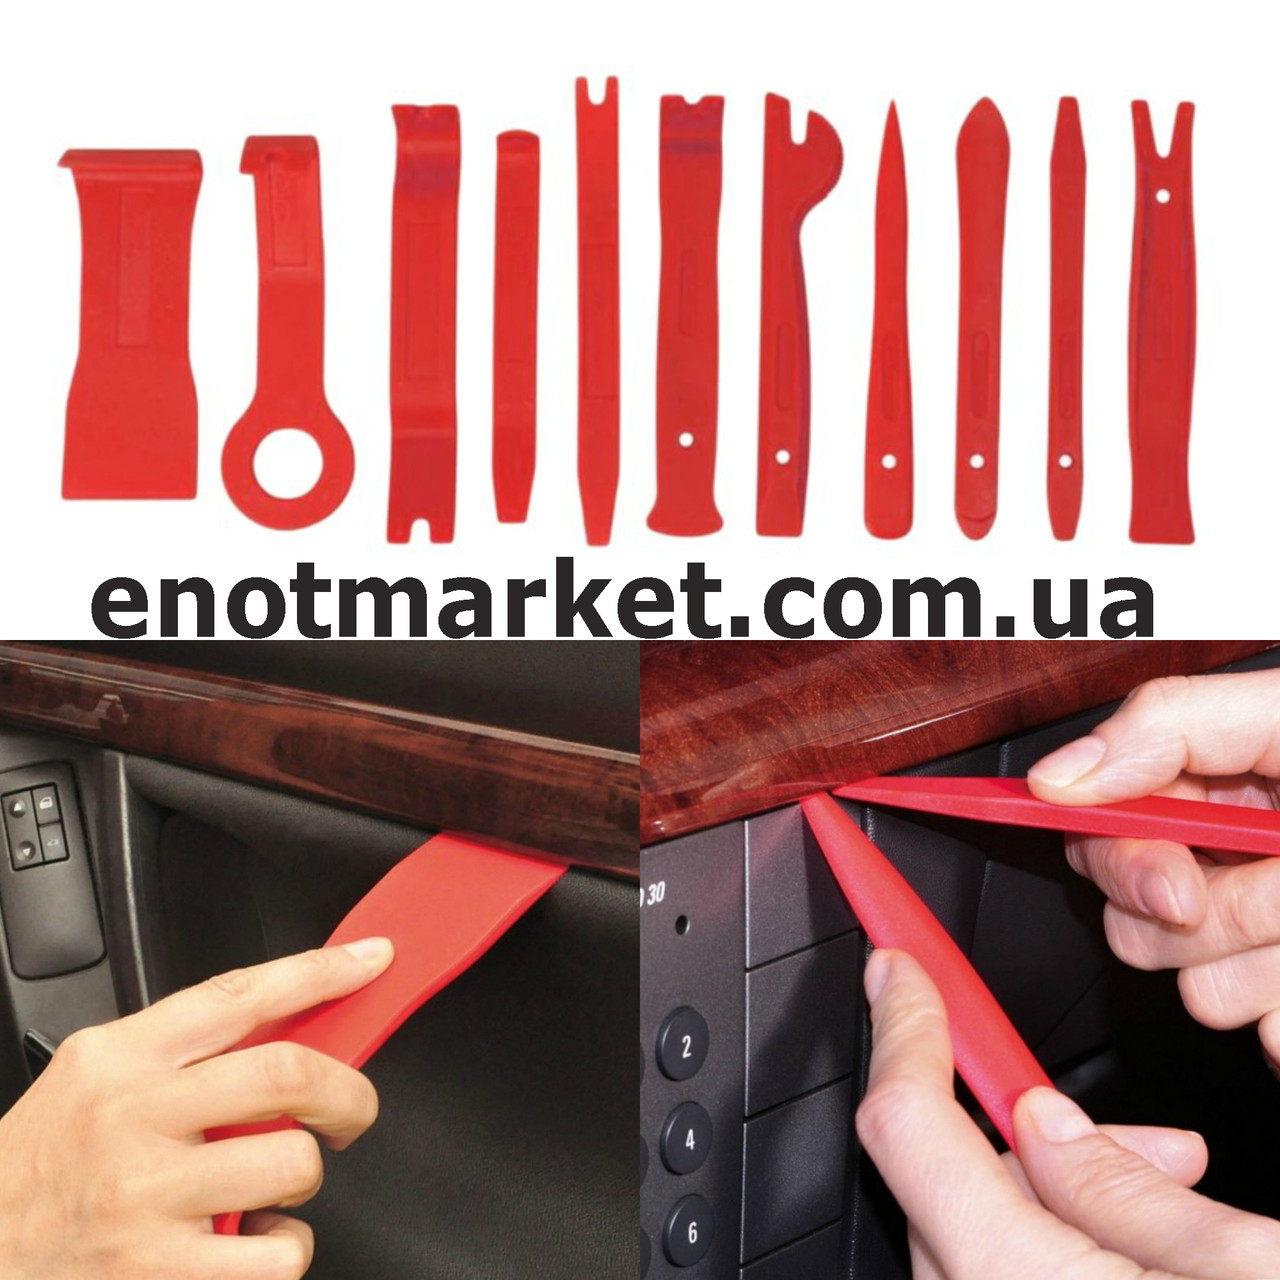 Набор инструментов съемники лопатки для снятия обшивки салона, панелей авто, магнитол, удаления клипс (11 шт.)